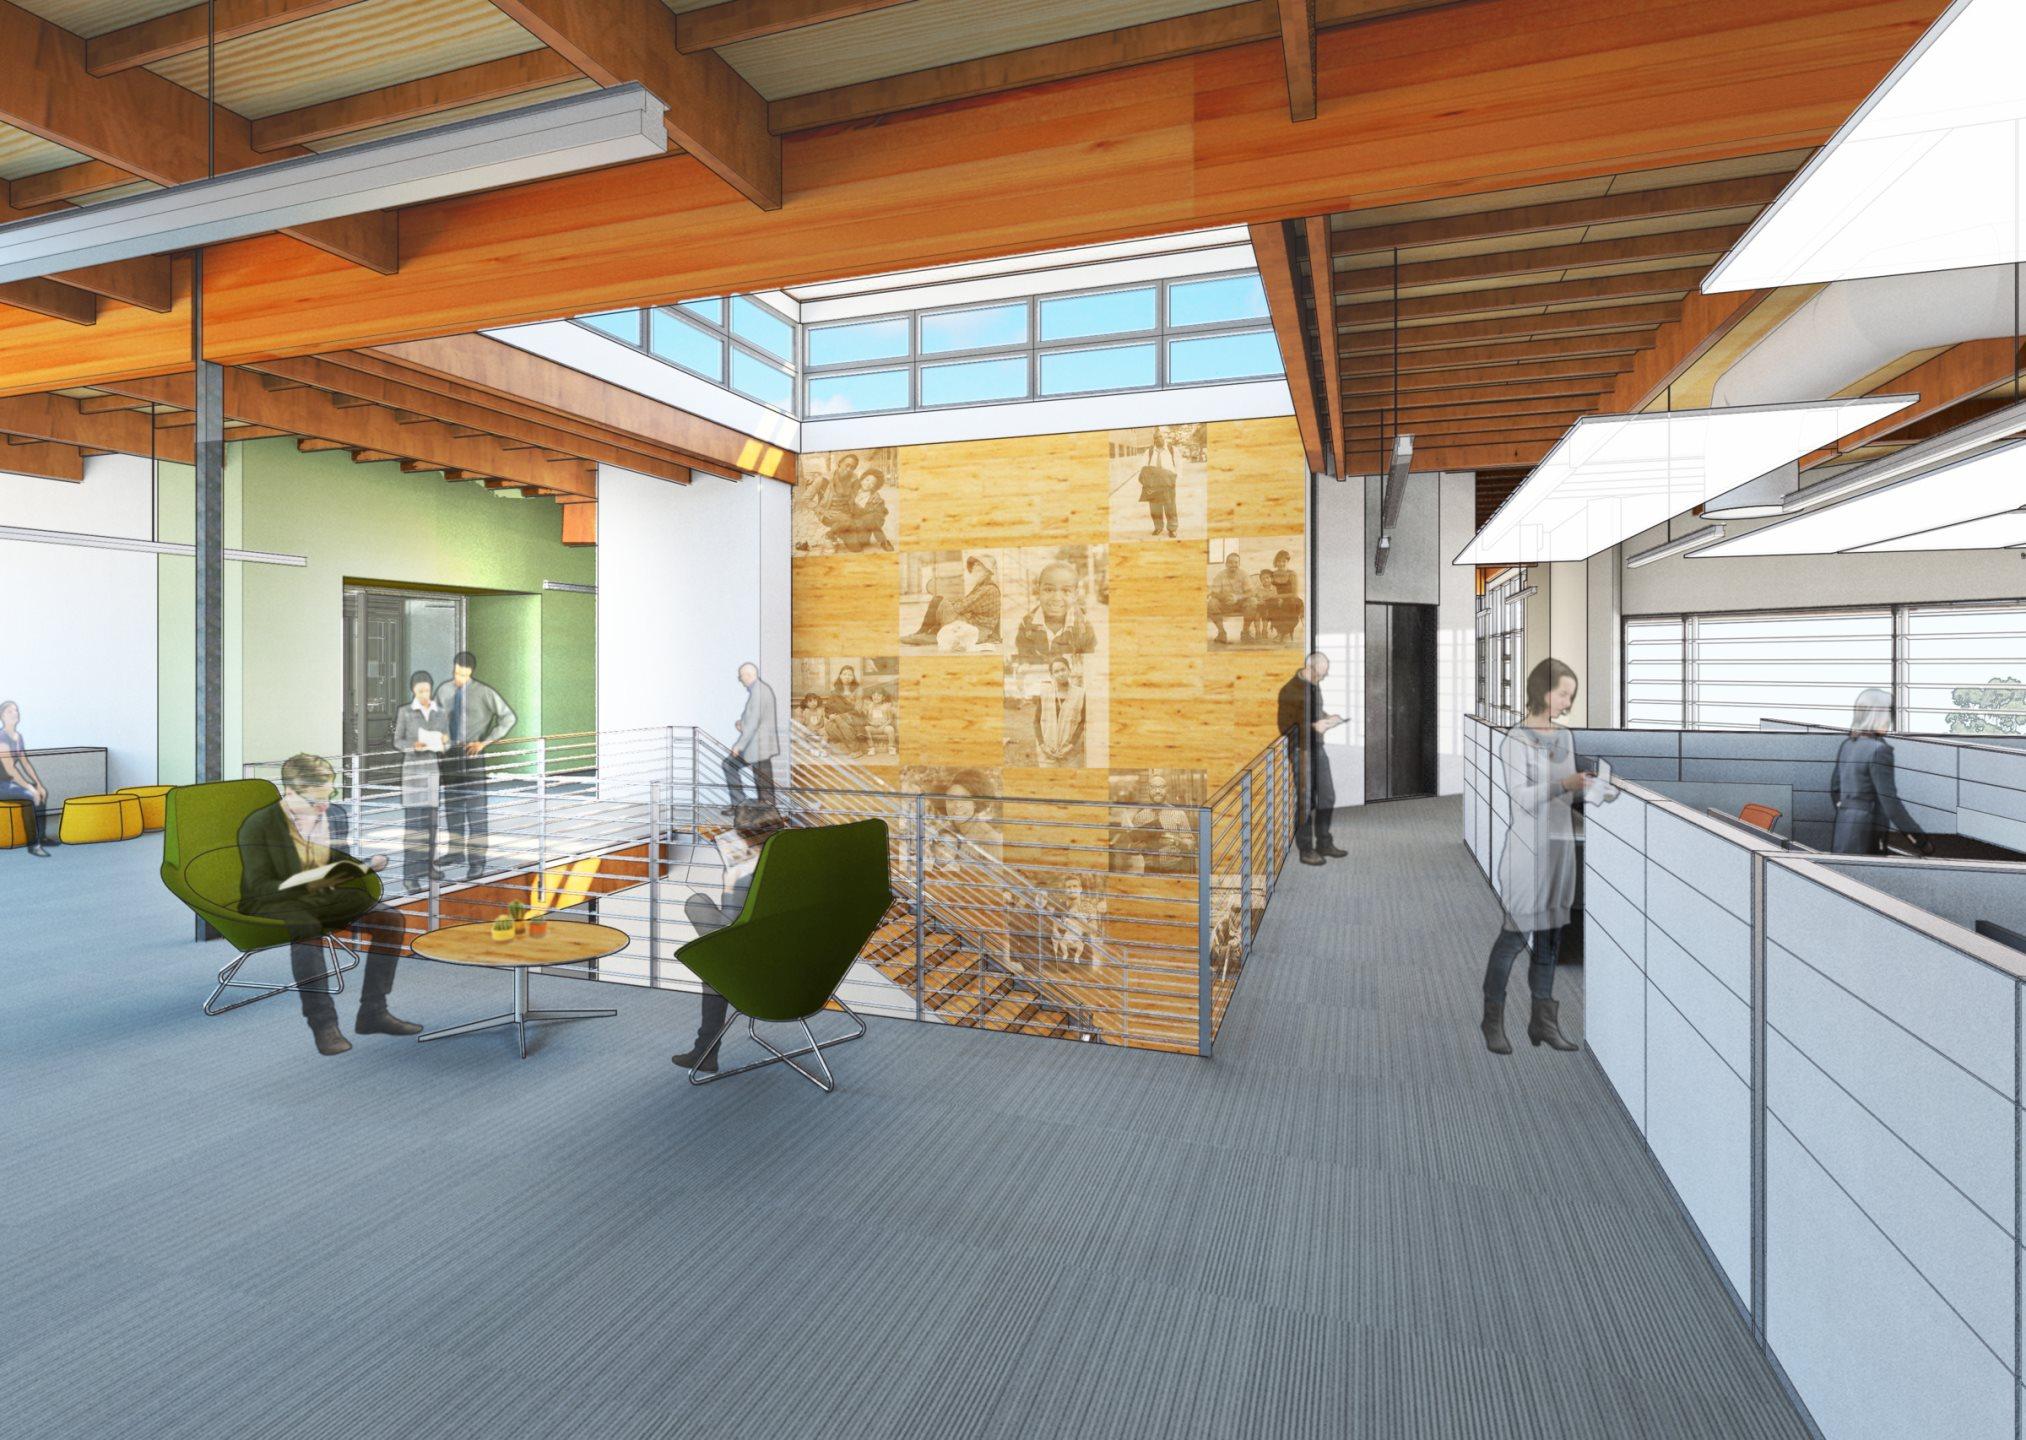 SD County   Housing And Community Development Office Renovation | BNIM